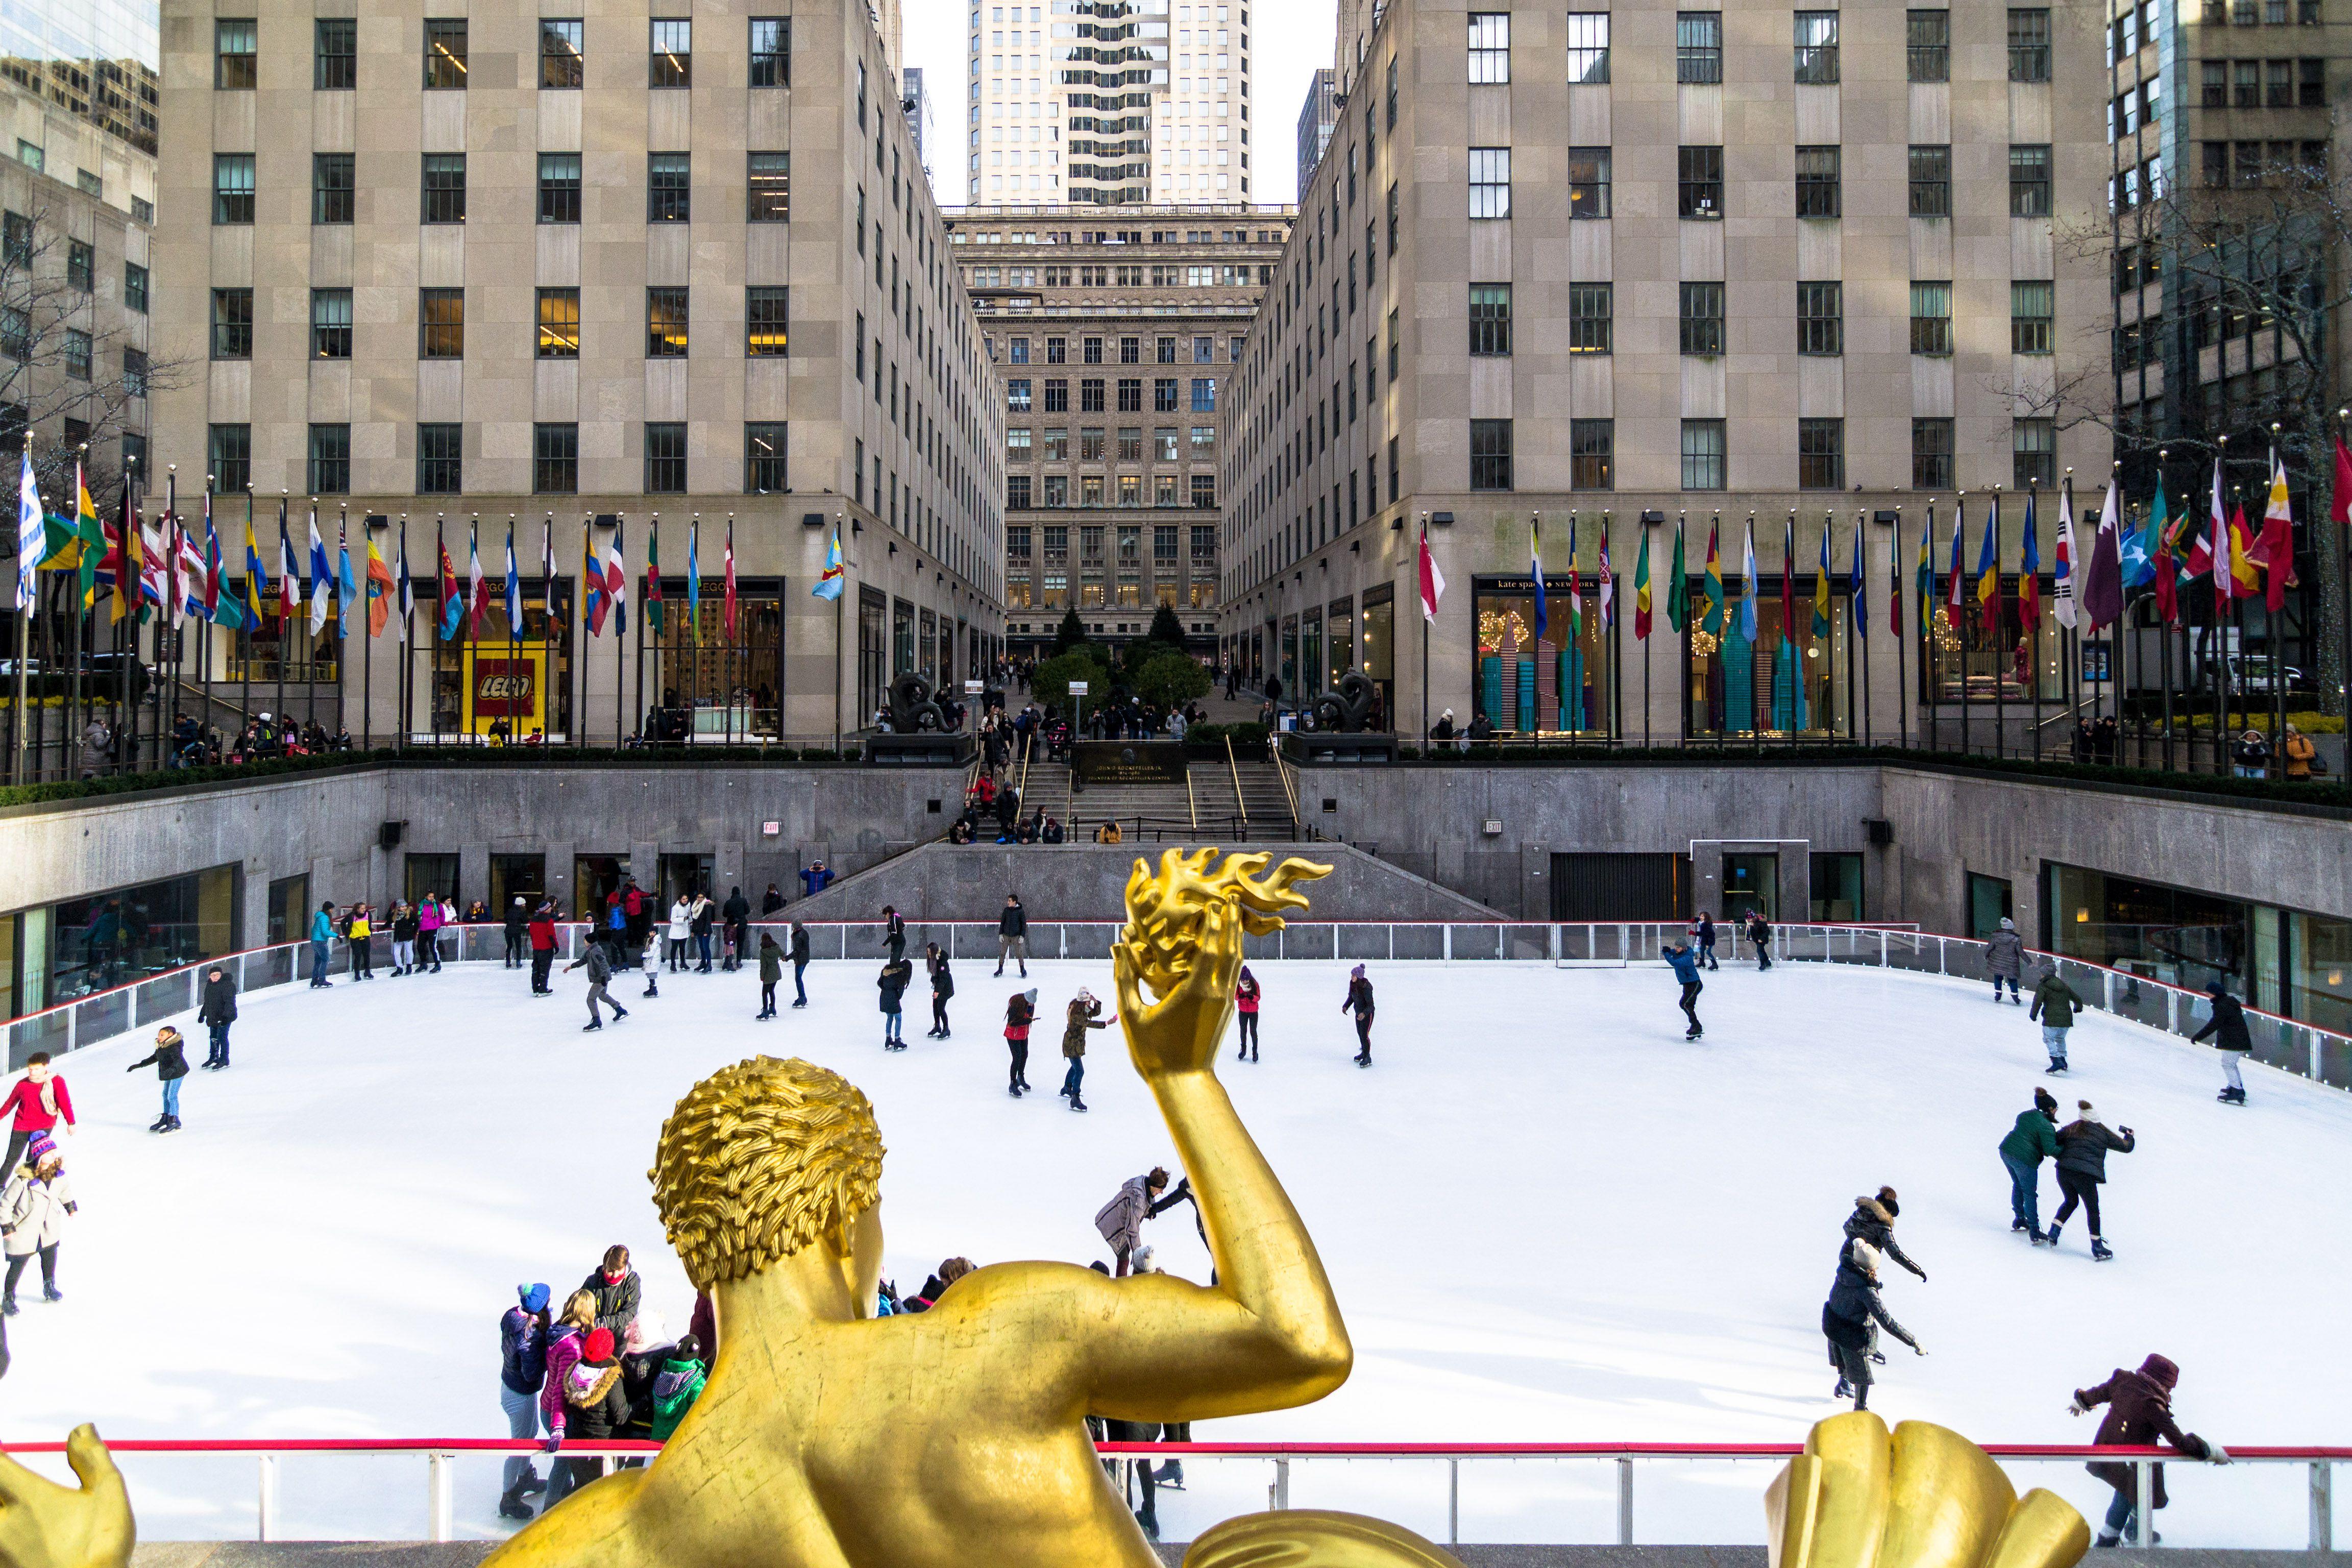 People ice skating at Rockefeller Center